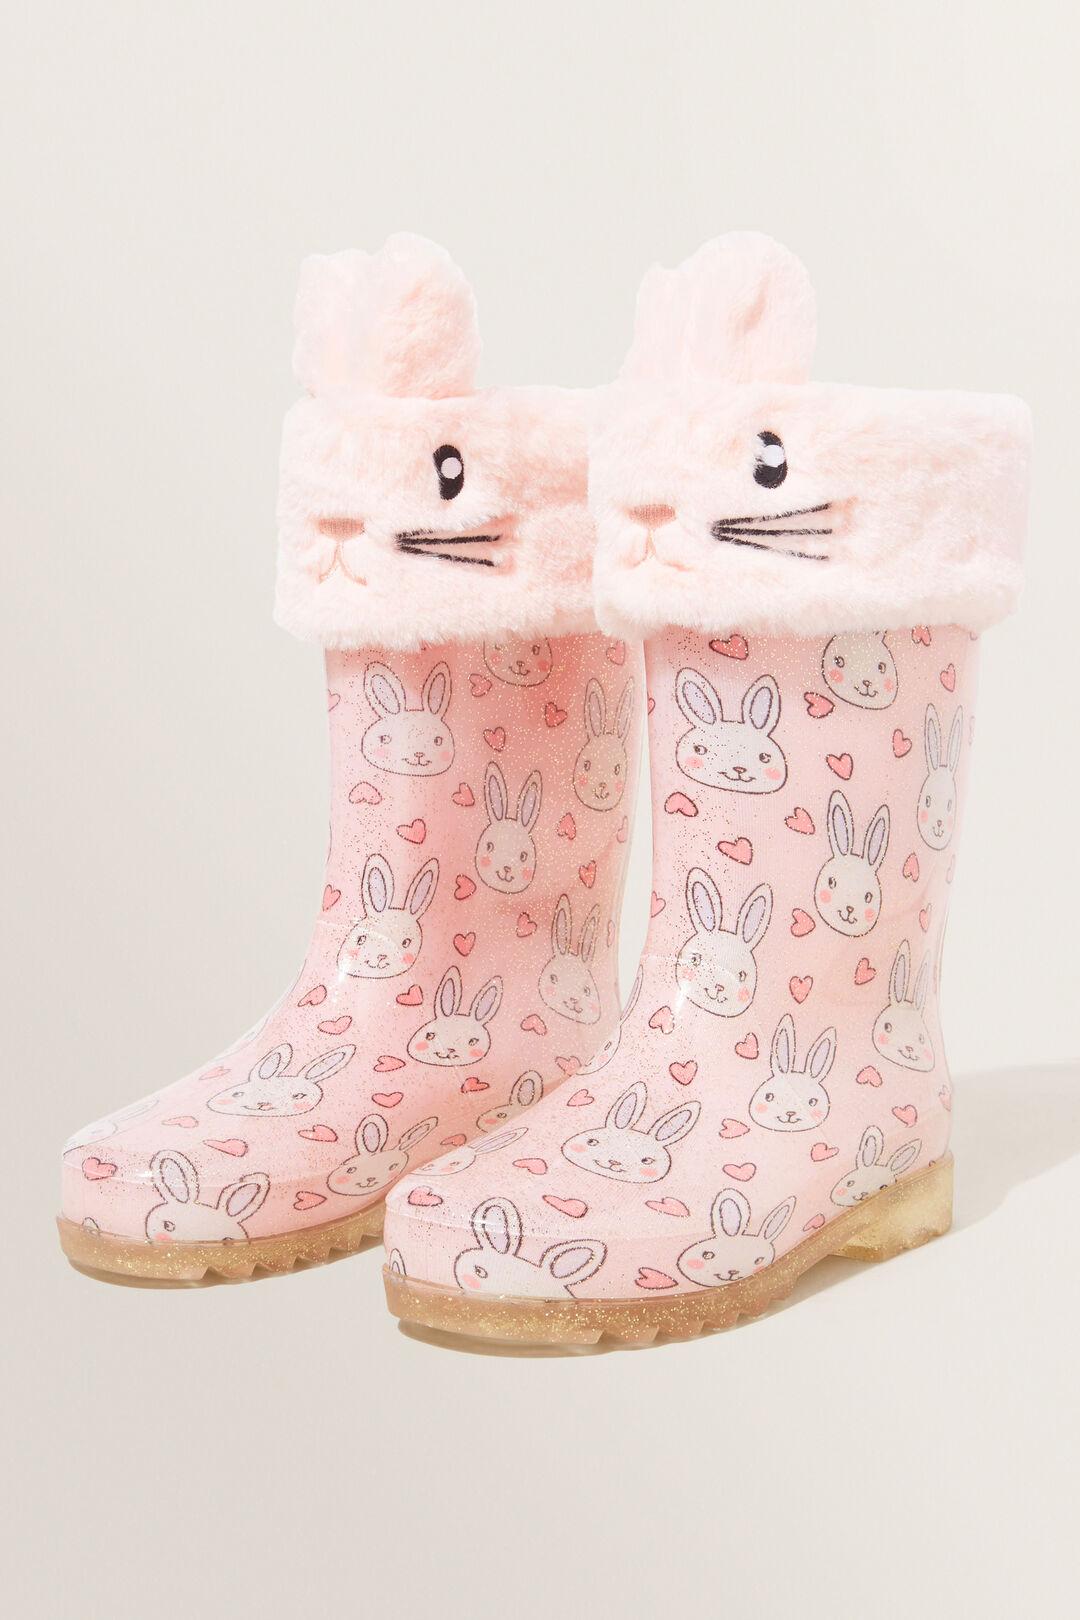 Bunny Gumboot Socks  DUSTY ROSE  hi-res